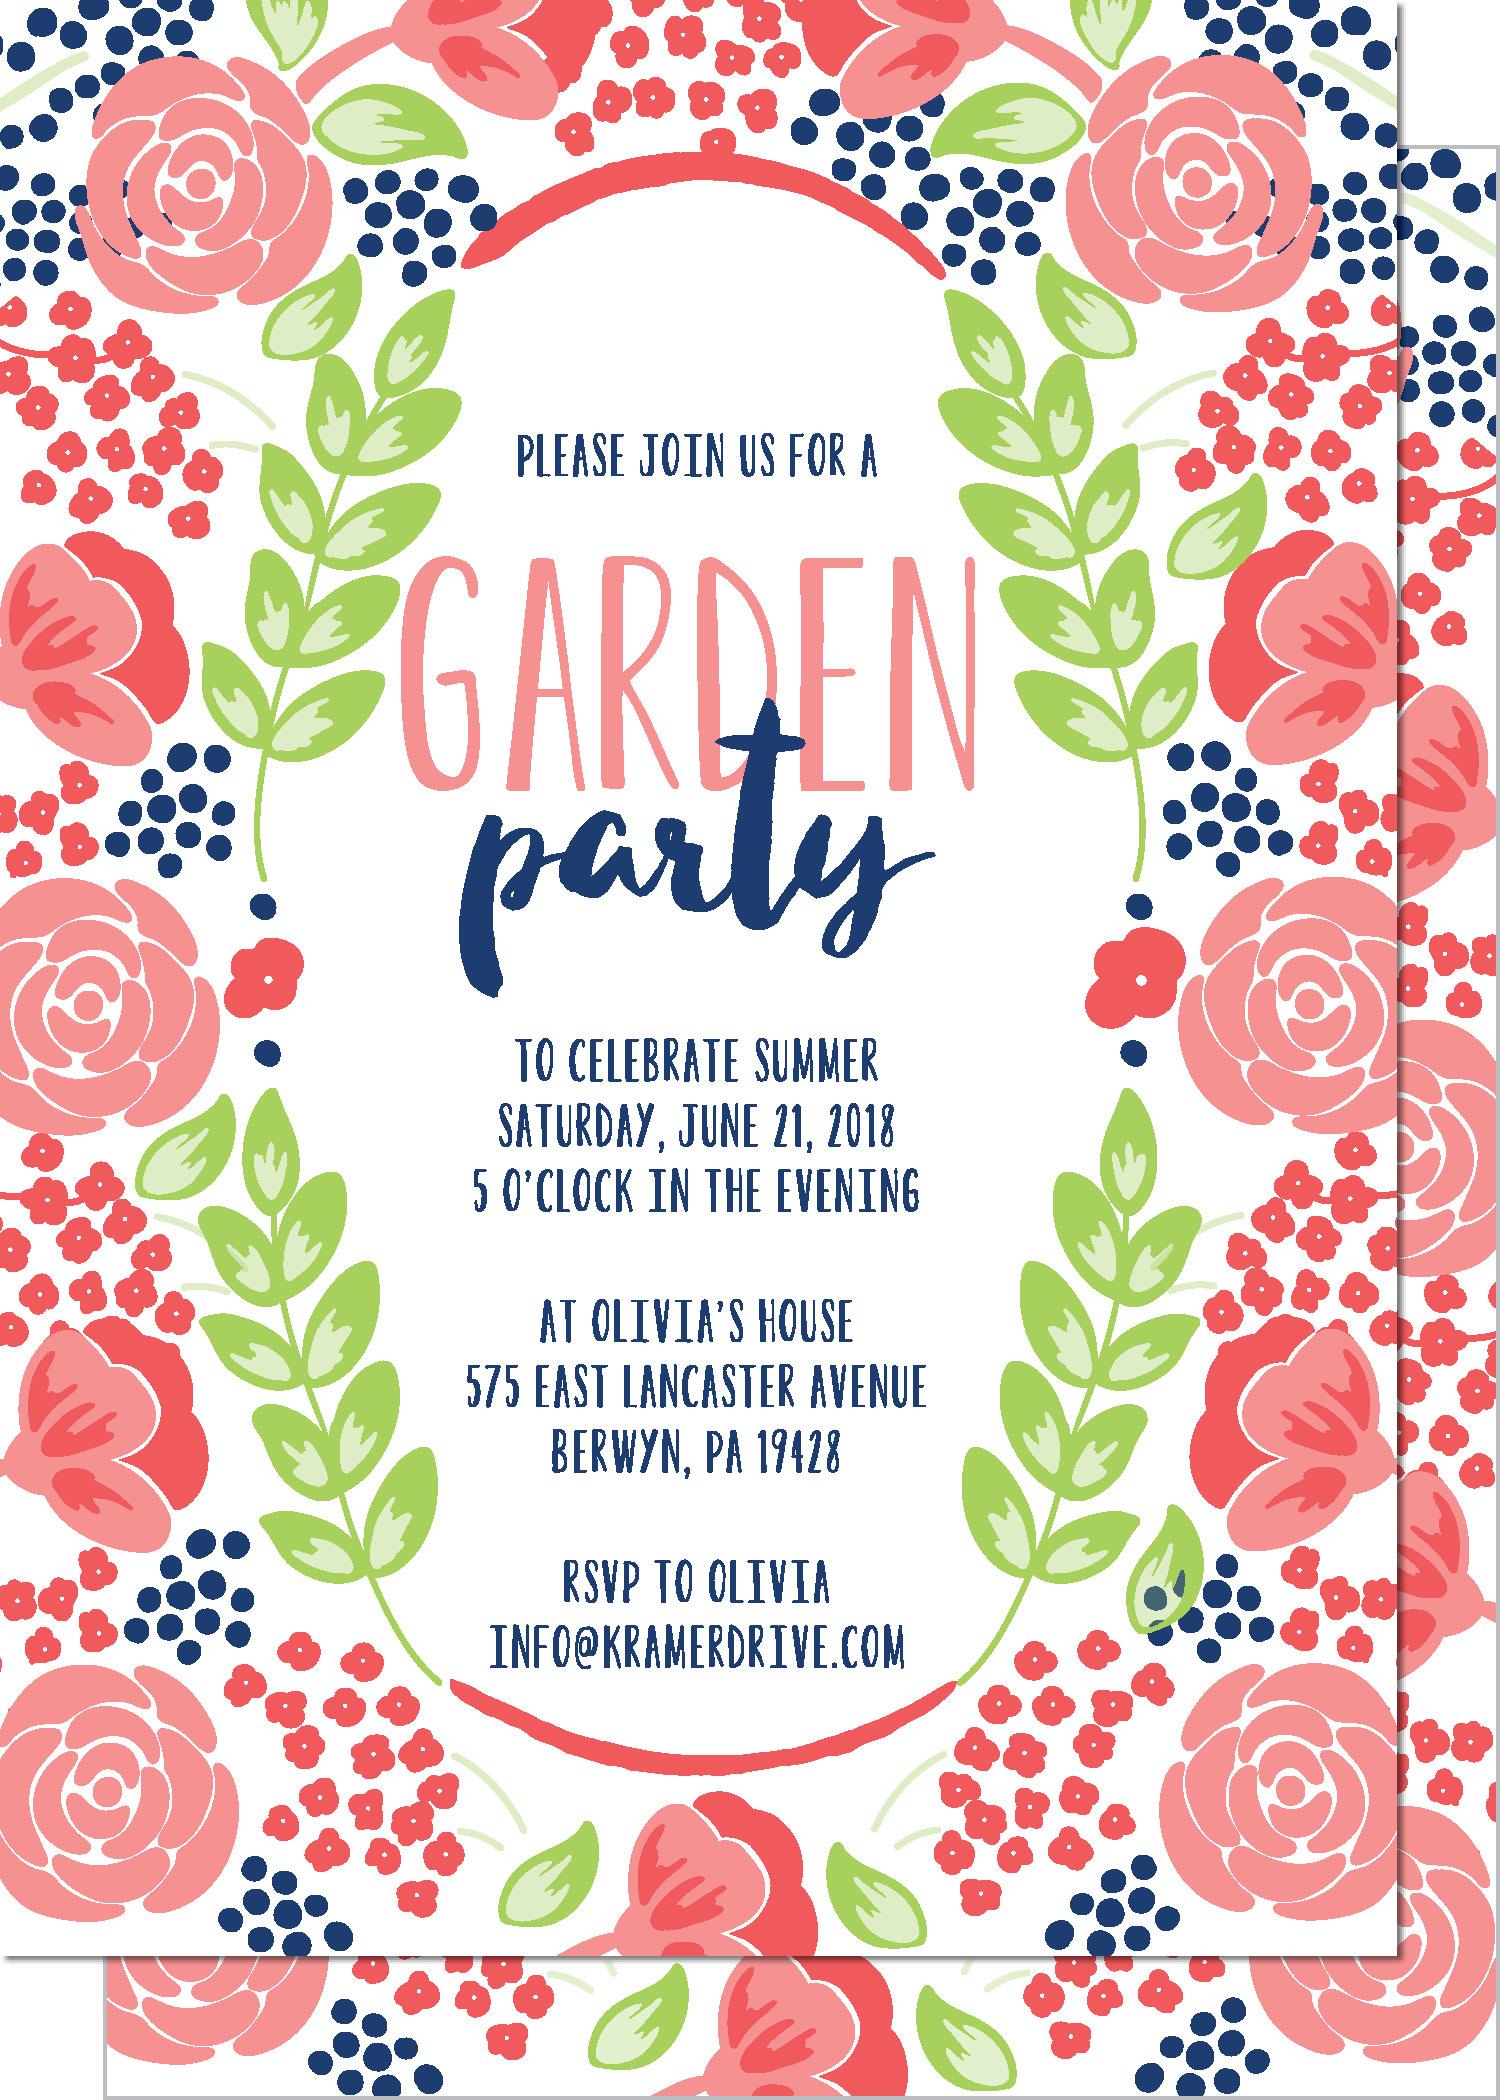 KD3153IN-PB Garden Party